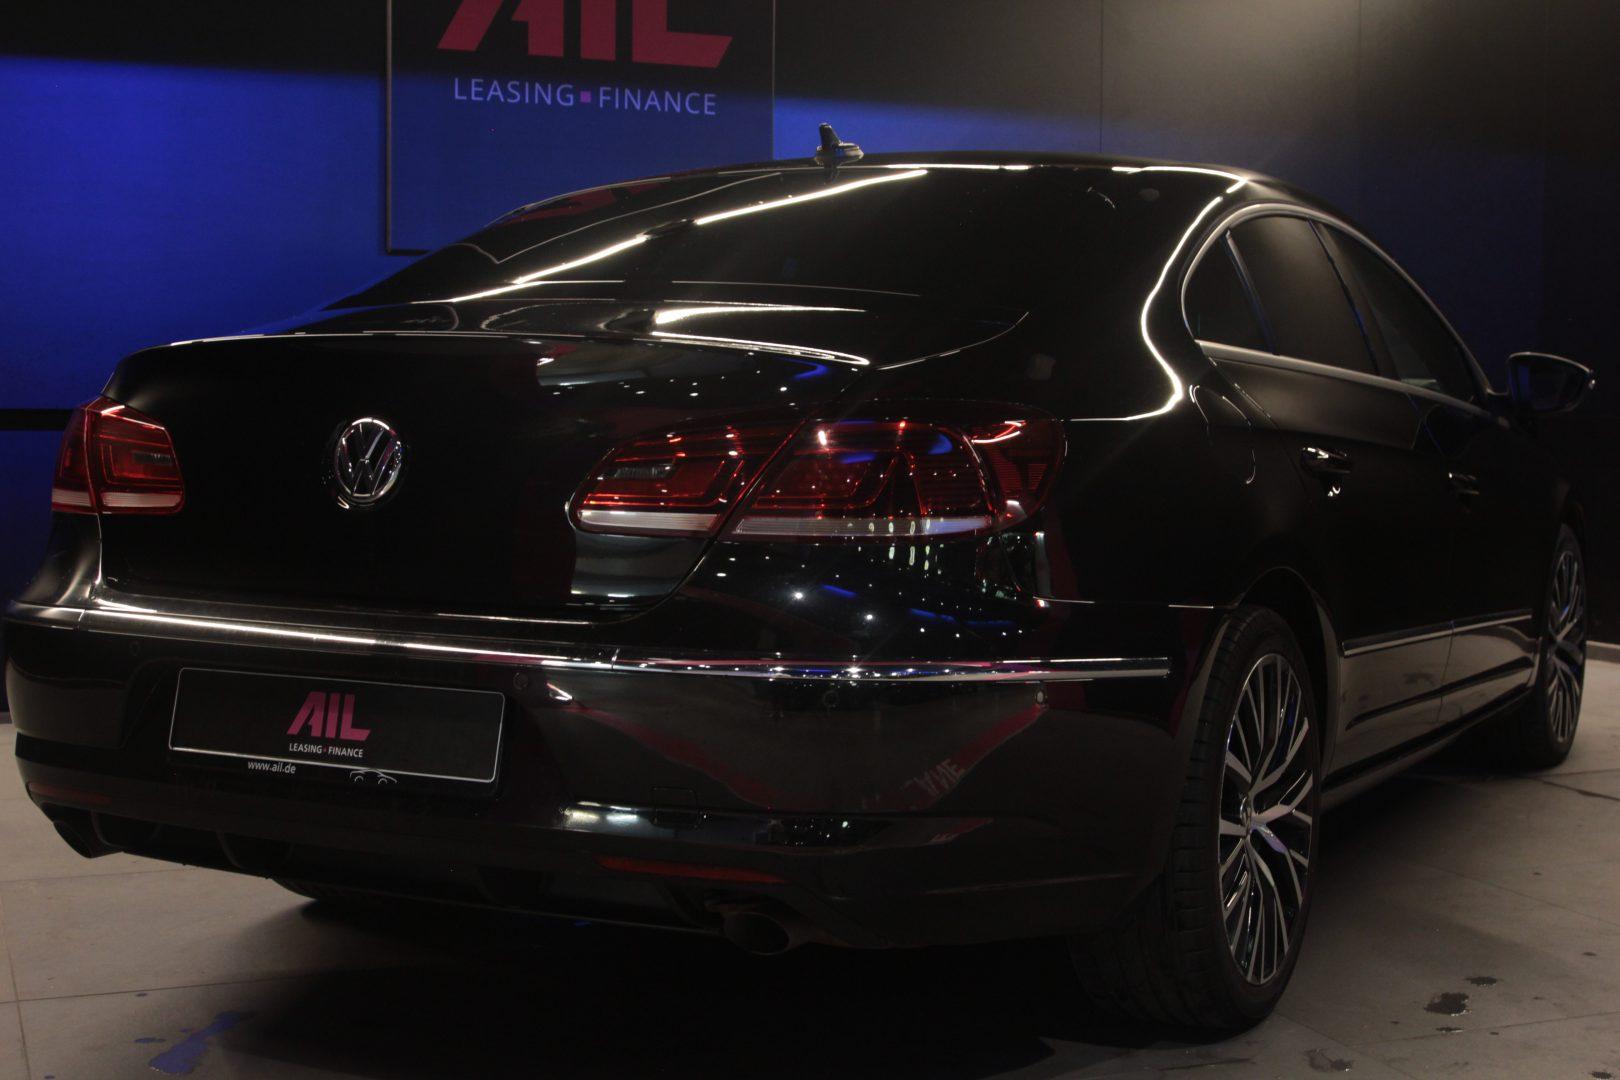 AIL VW CC 2.0TDI Basis BMT 4Motion DSG 5